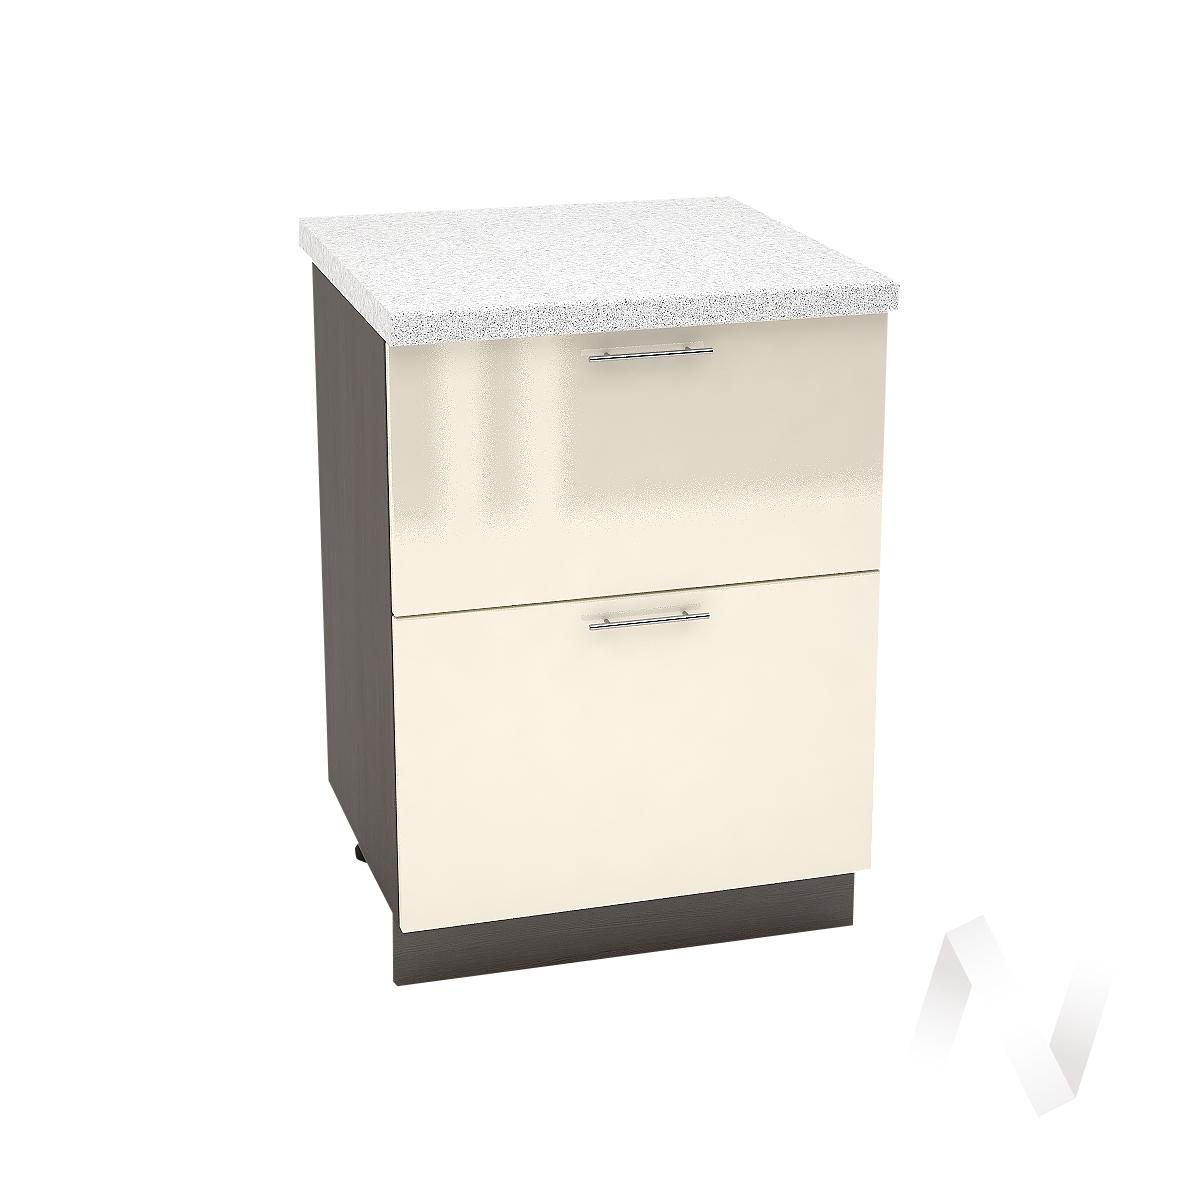 "Кухня ""Валерия-М"": Шкаф нижний с 2-мя ящиками 600, ШН2Я 600 (Ваниль глянец/корпус венге) УТ-000274"